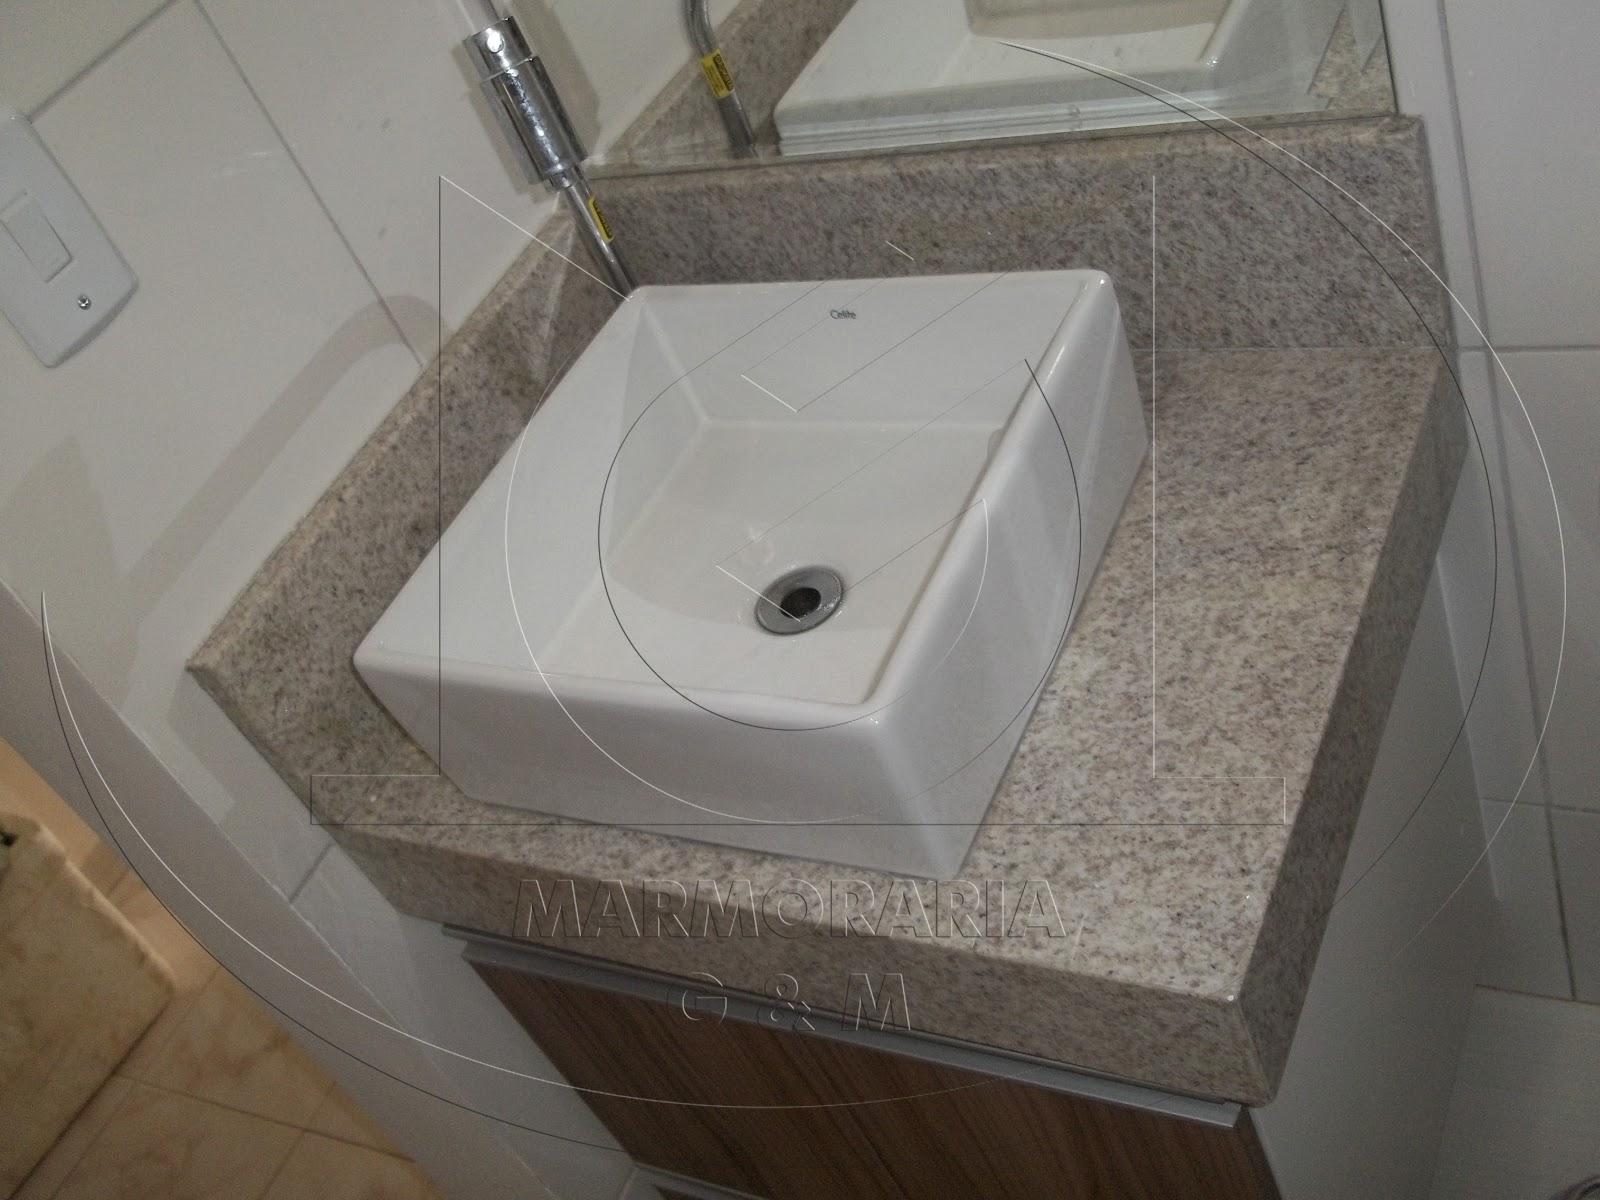 Lavatório em Granito Branco Siena Marmoraria Goiás e Minas #5D5041 1600x1200 Banheiro Branco Siena